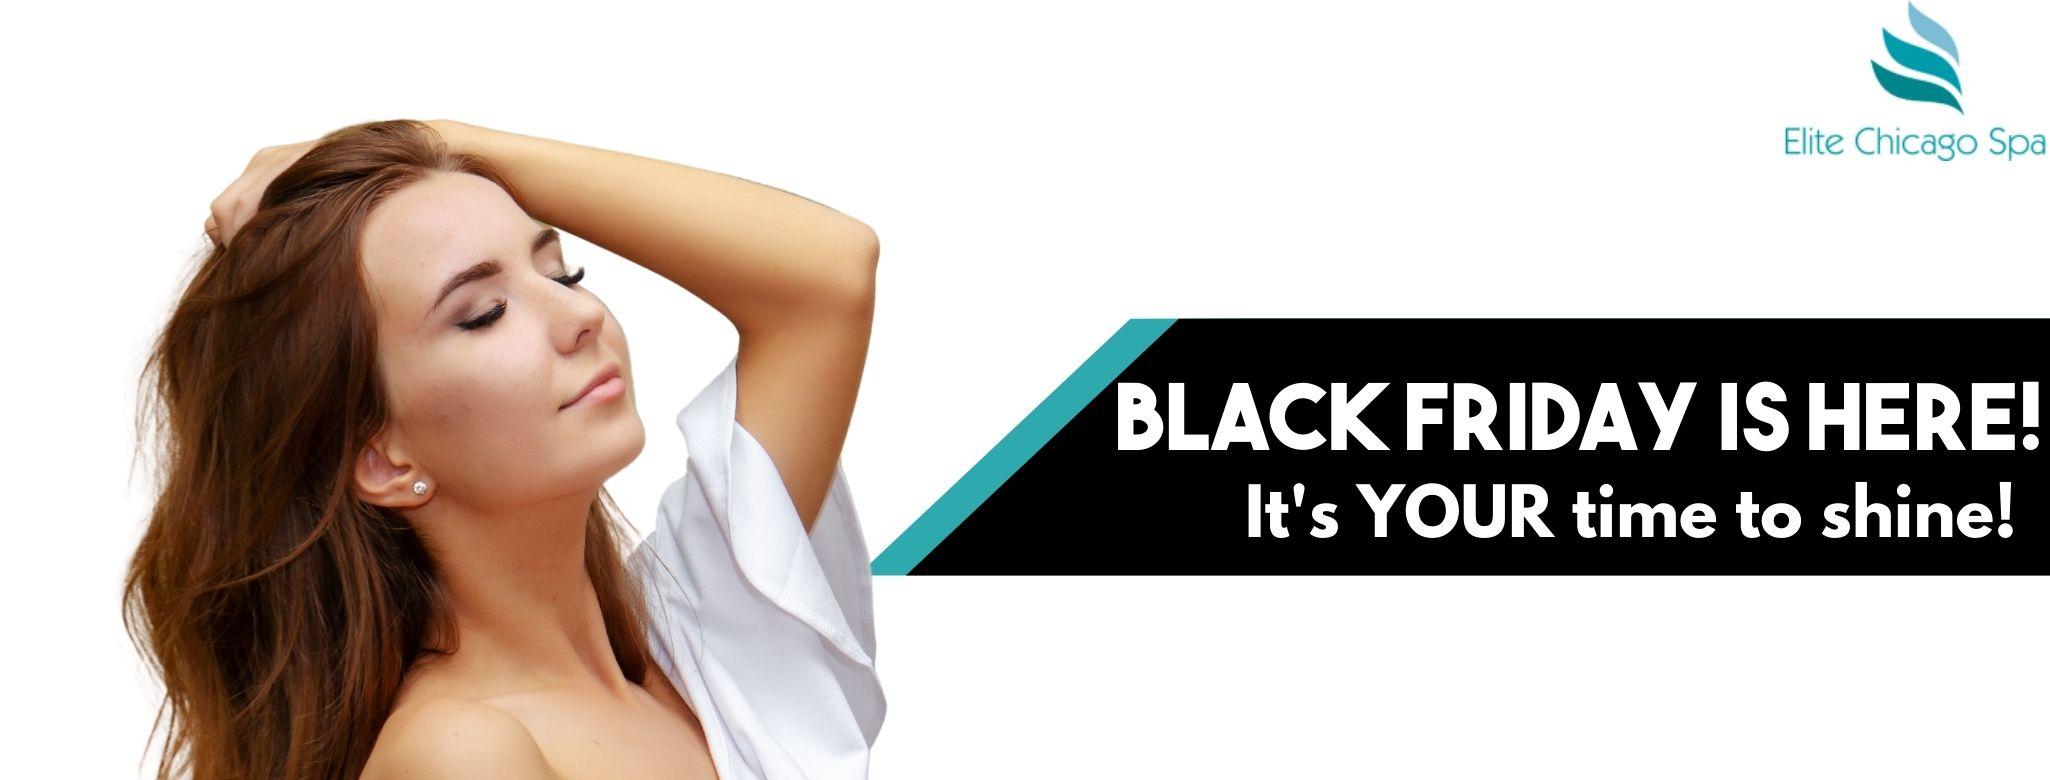 Black friday spa deals 2020 Chicago IL